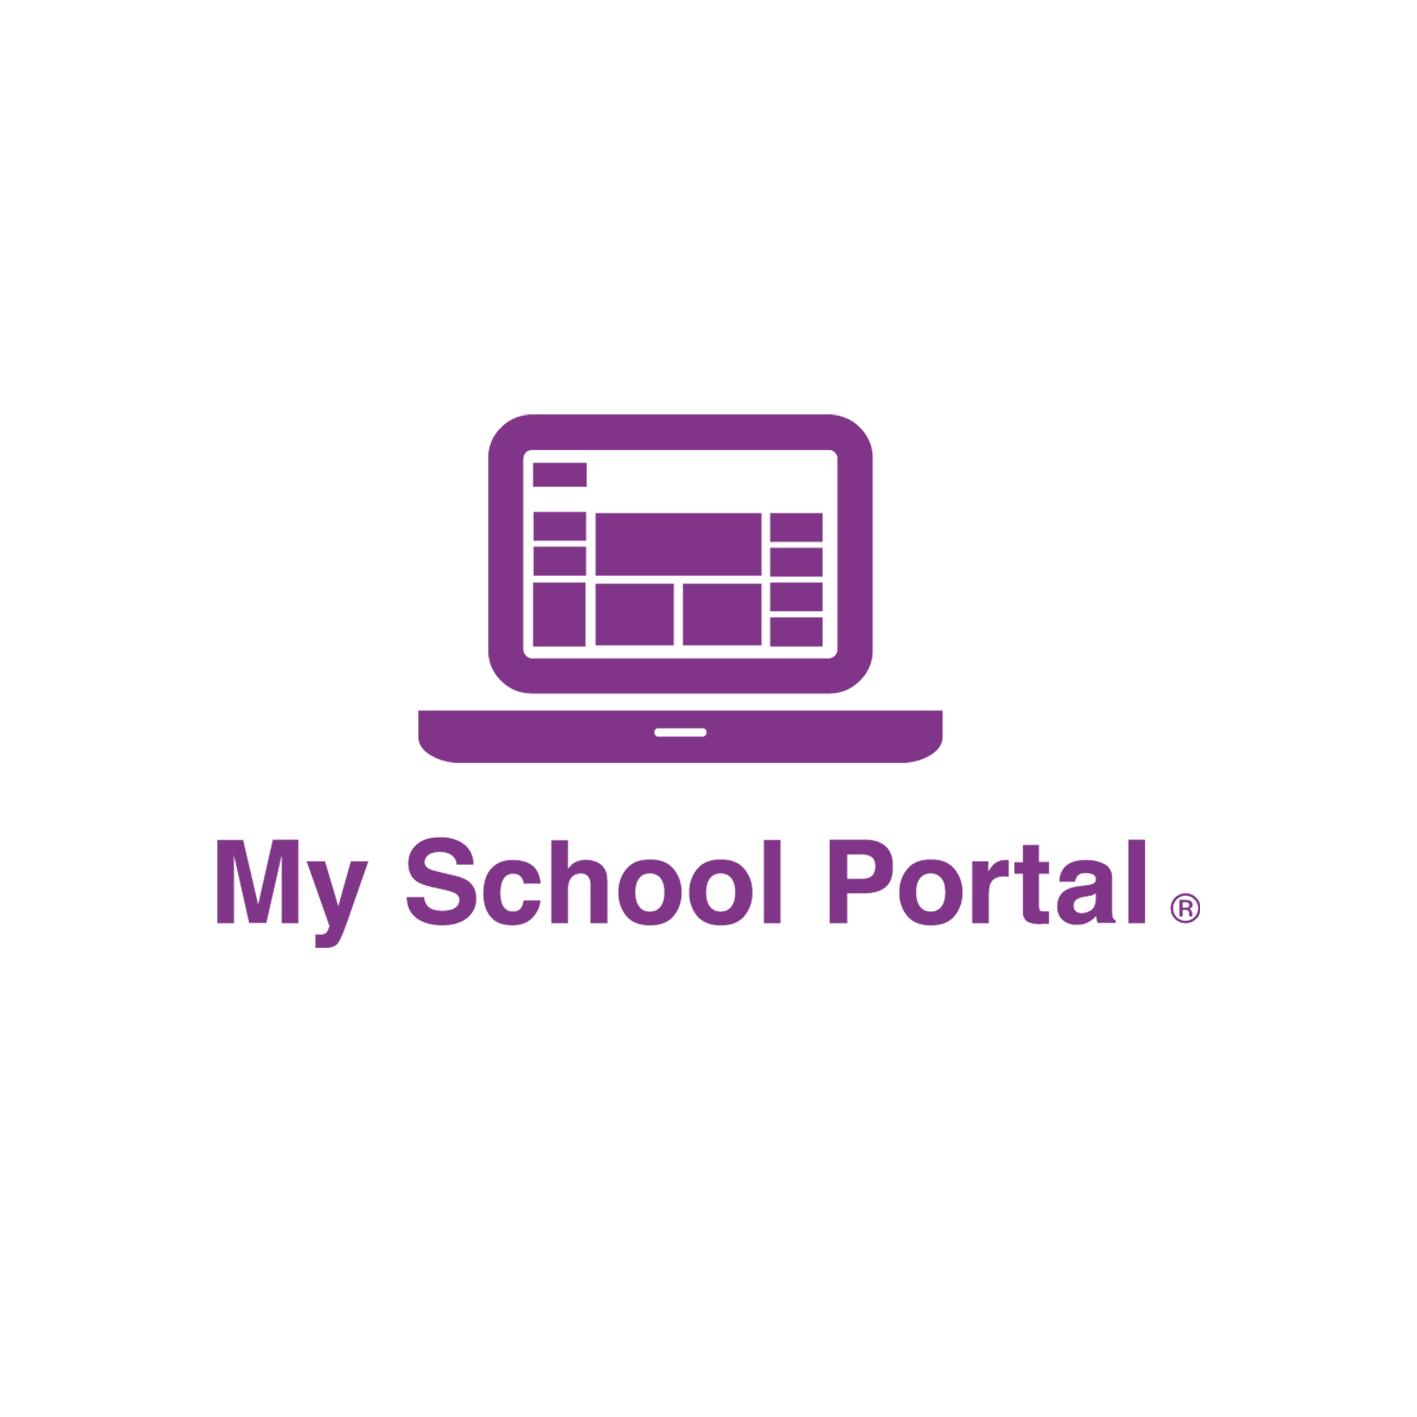 my school portal